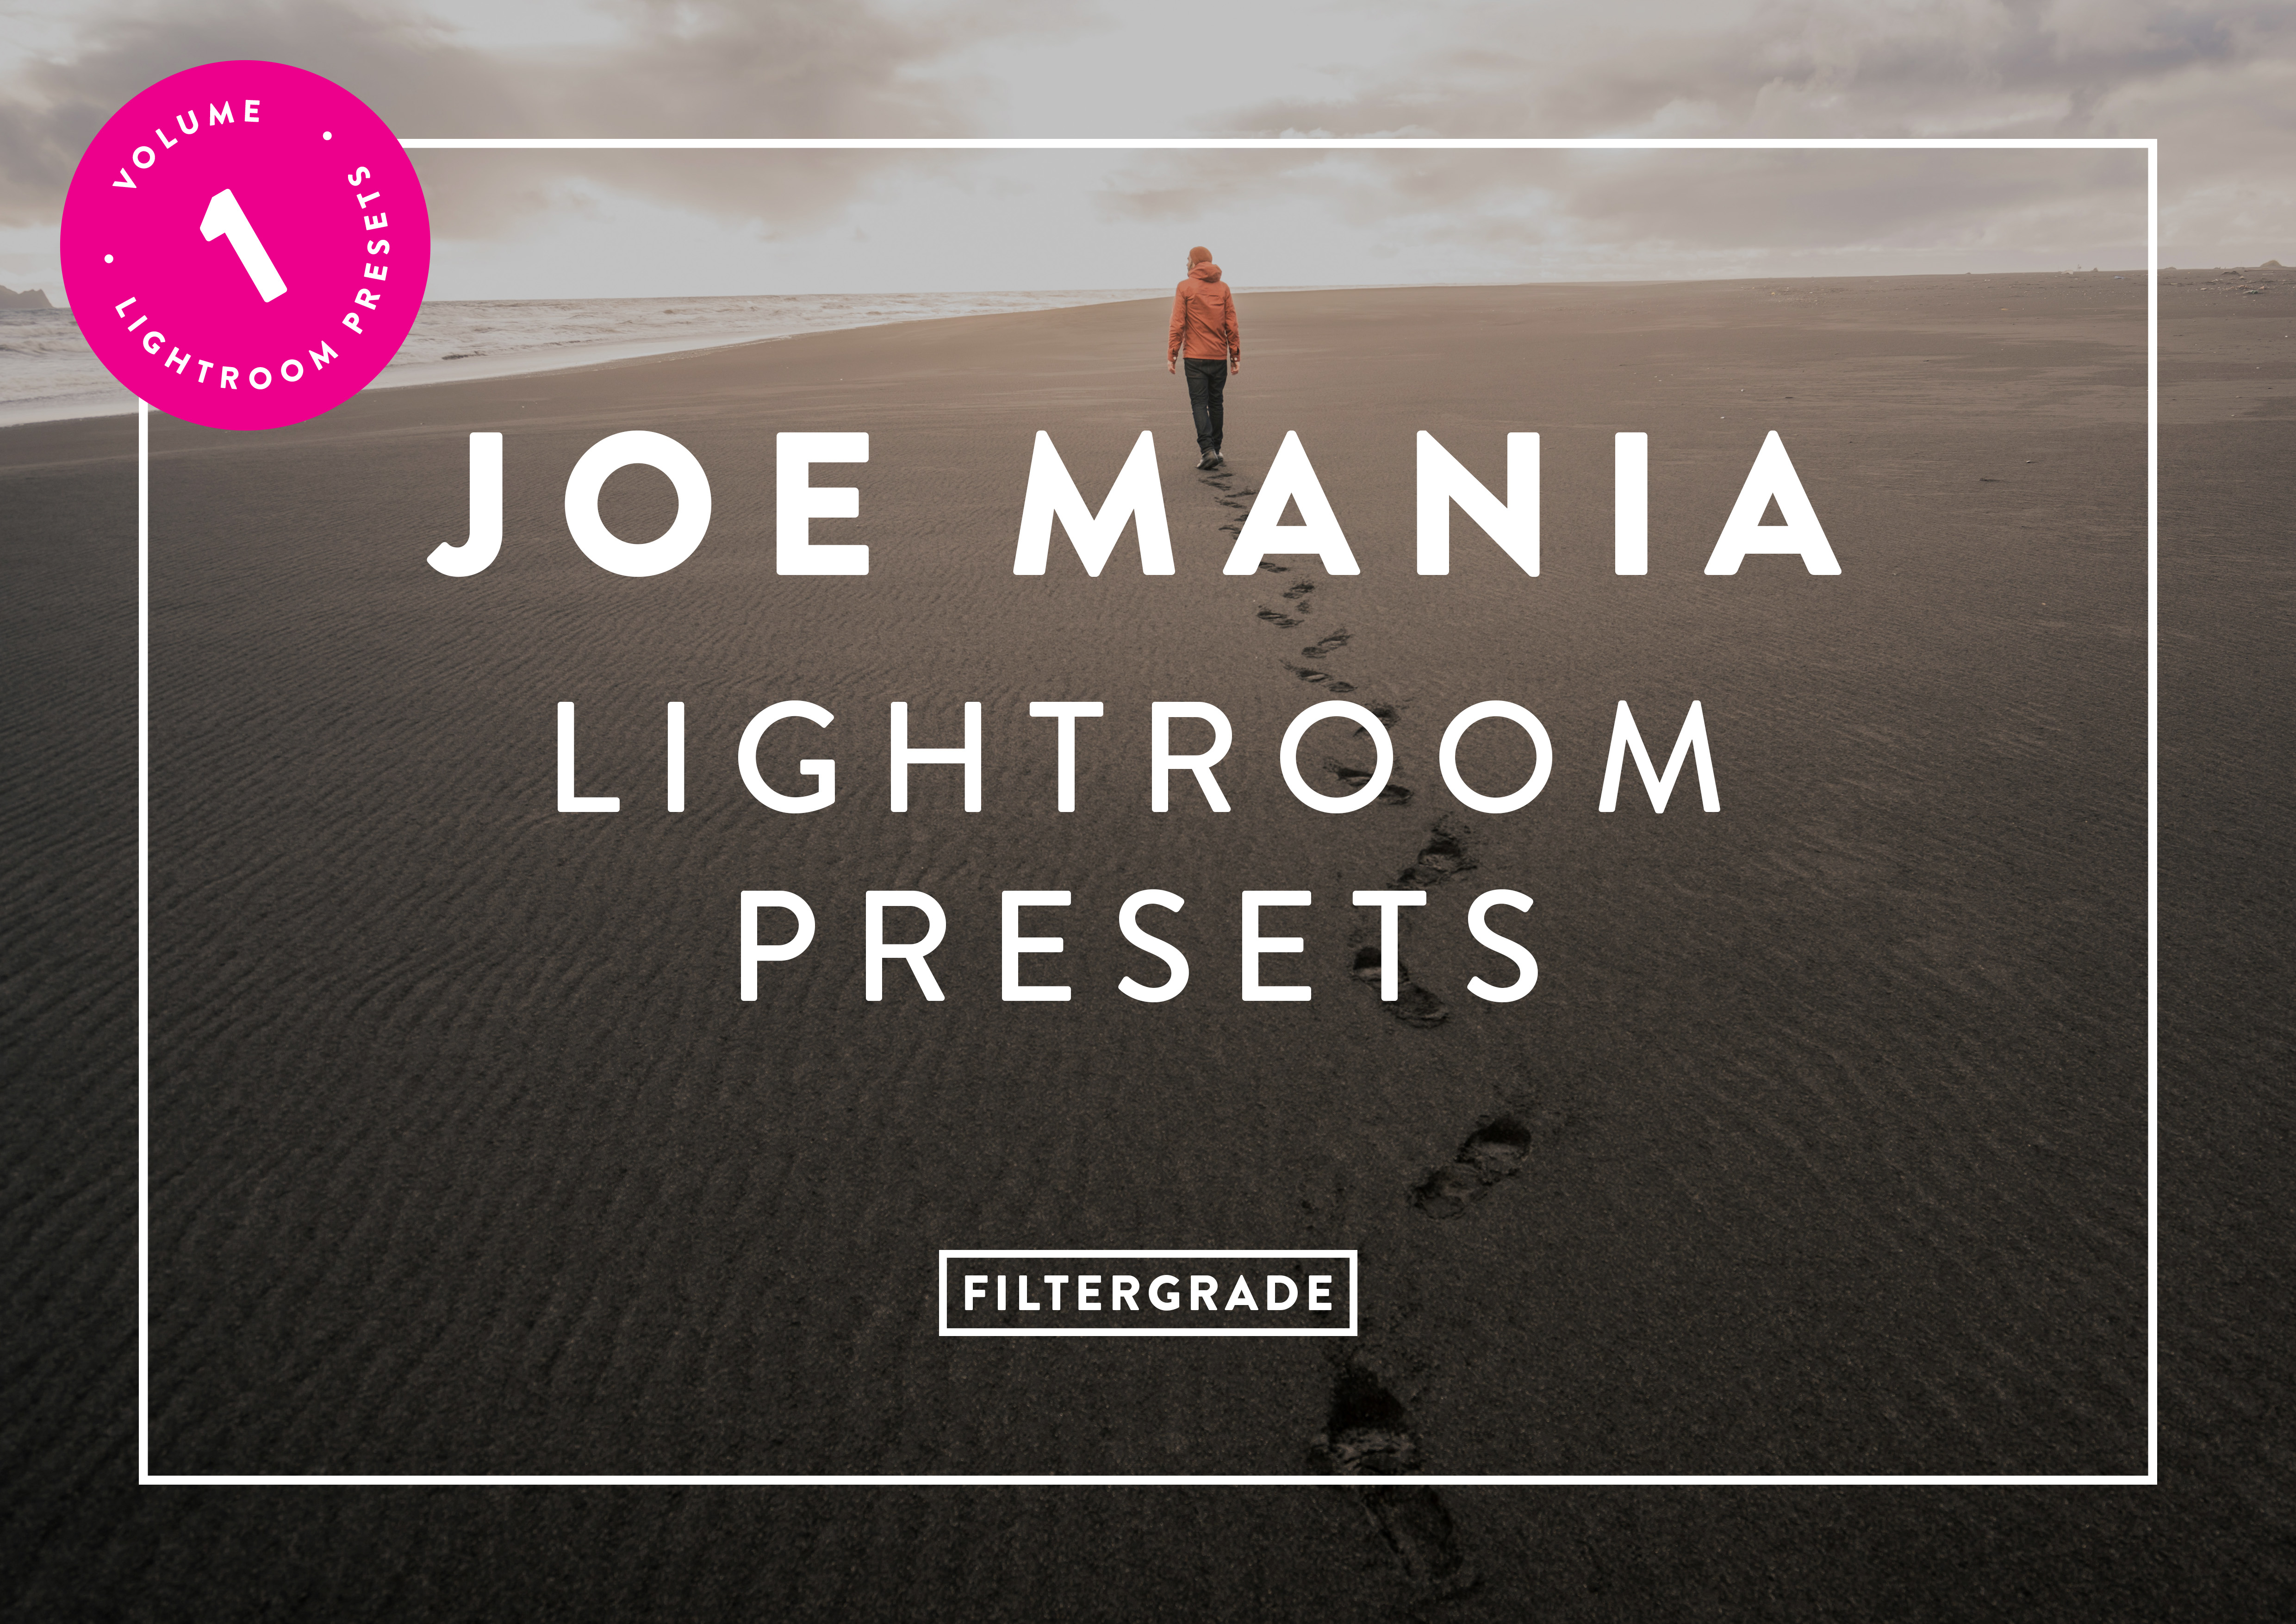 FEATURED - 10 Joe Mania Lightroom Presets - Joe Mania Photography - FilterGrade Digital Marketplace